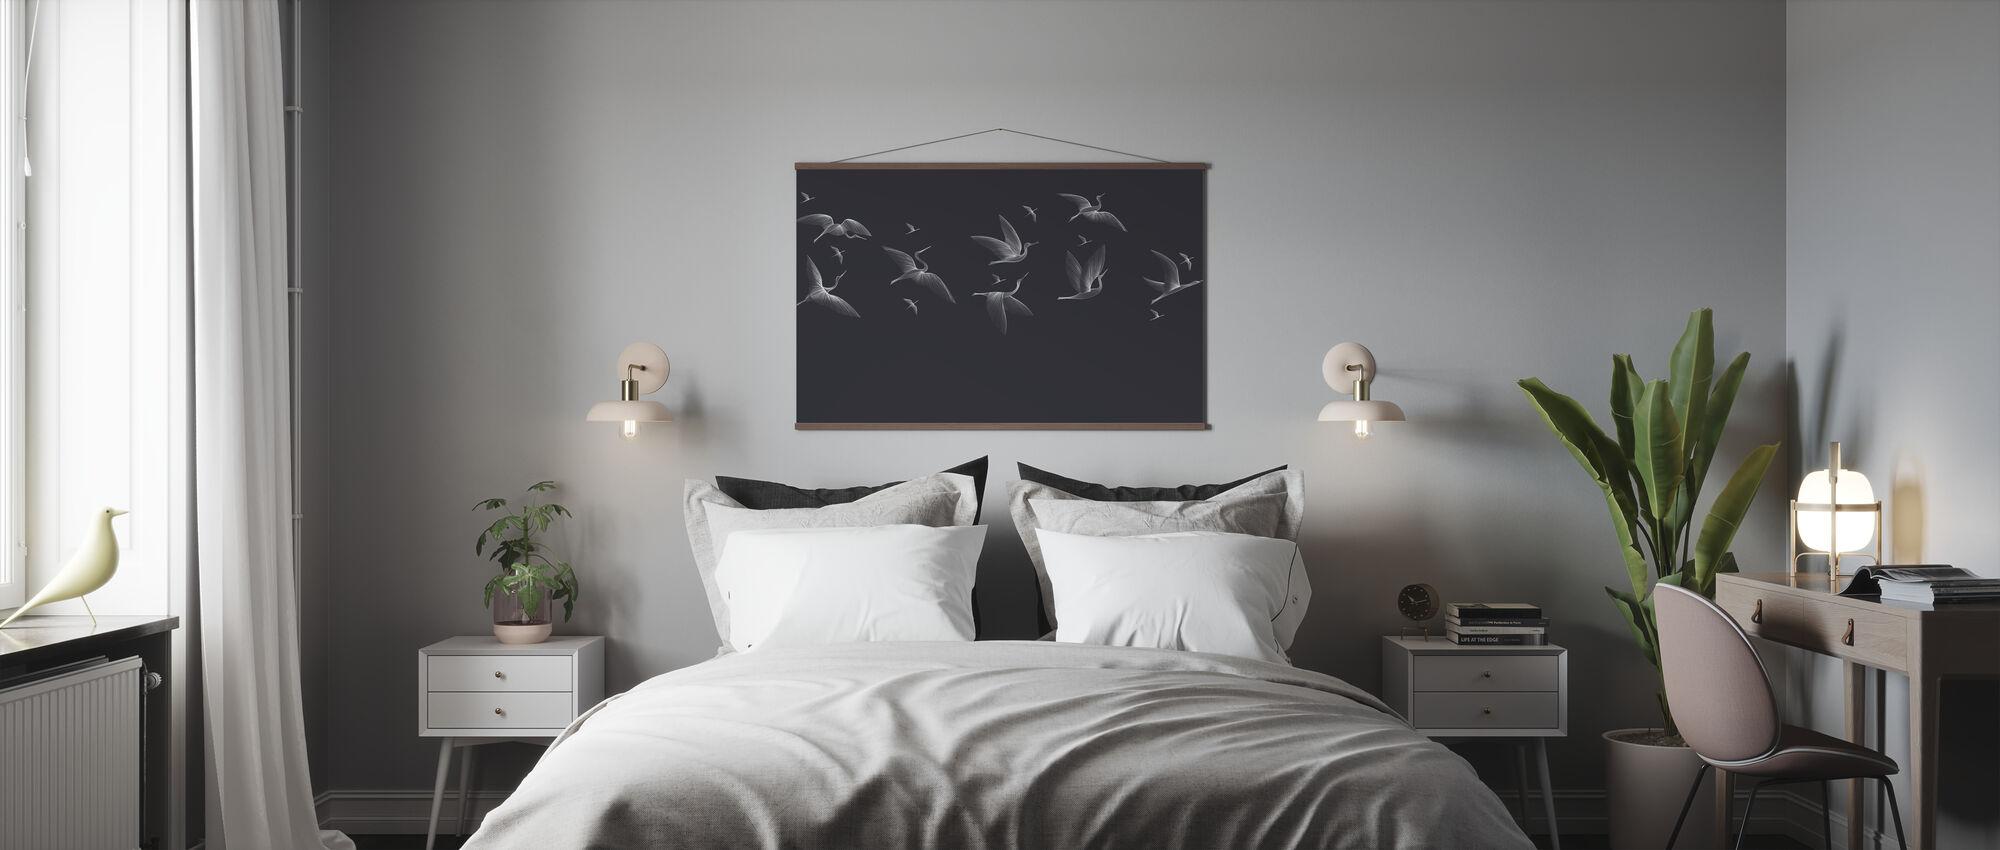 Where We Land - Blue - Poster - Bedroom